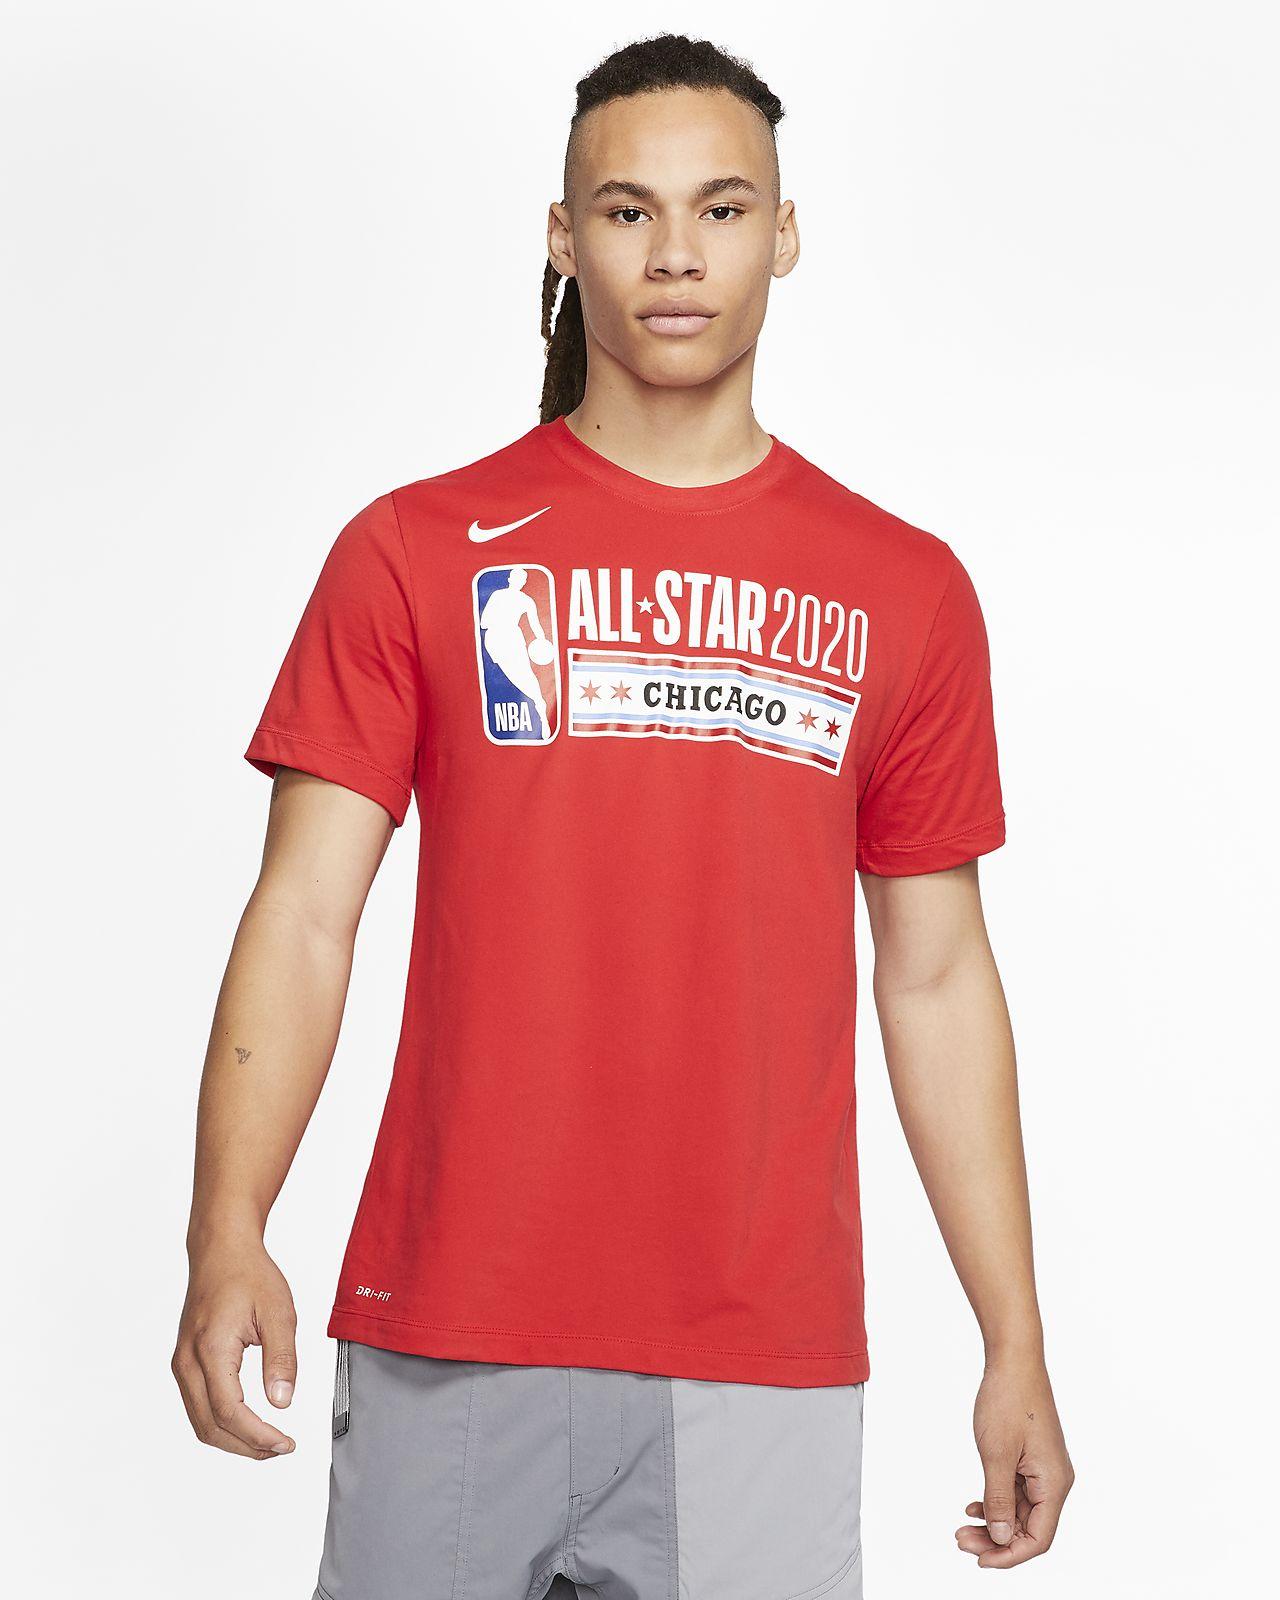 All-Star Logo Men's Nike Dri-FIT NBA T-Shirt